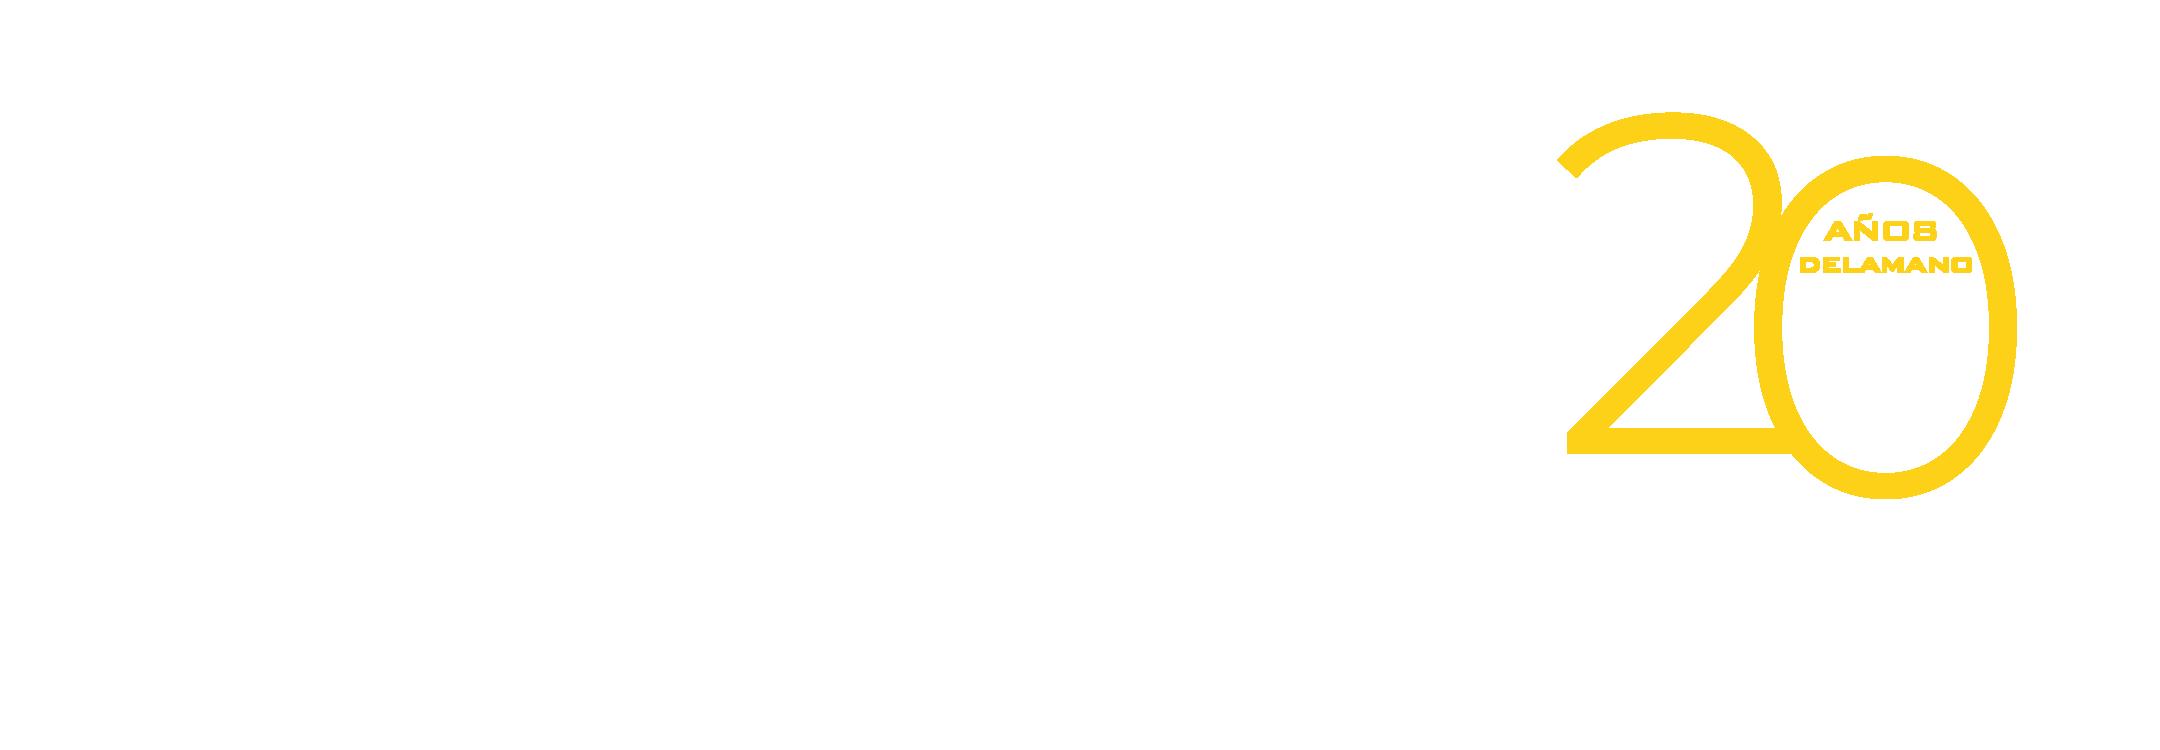 Digital Hand Made